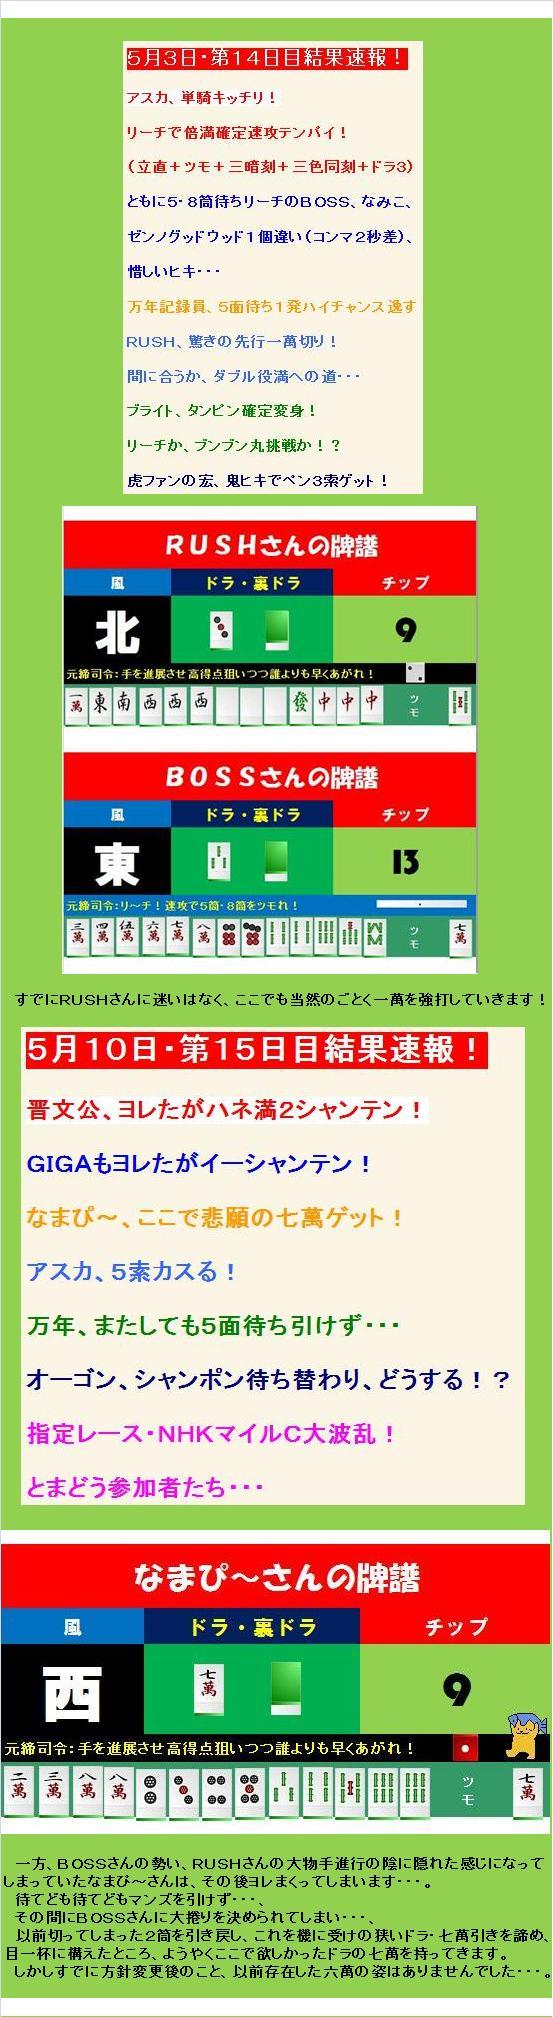 20100226・A組回顧08.jpg